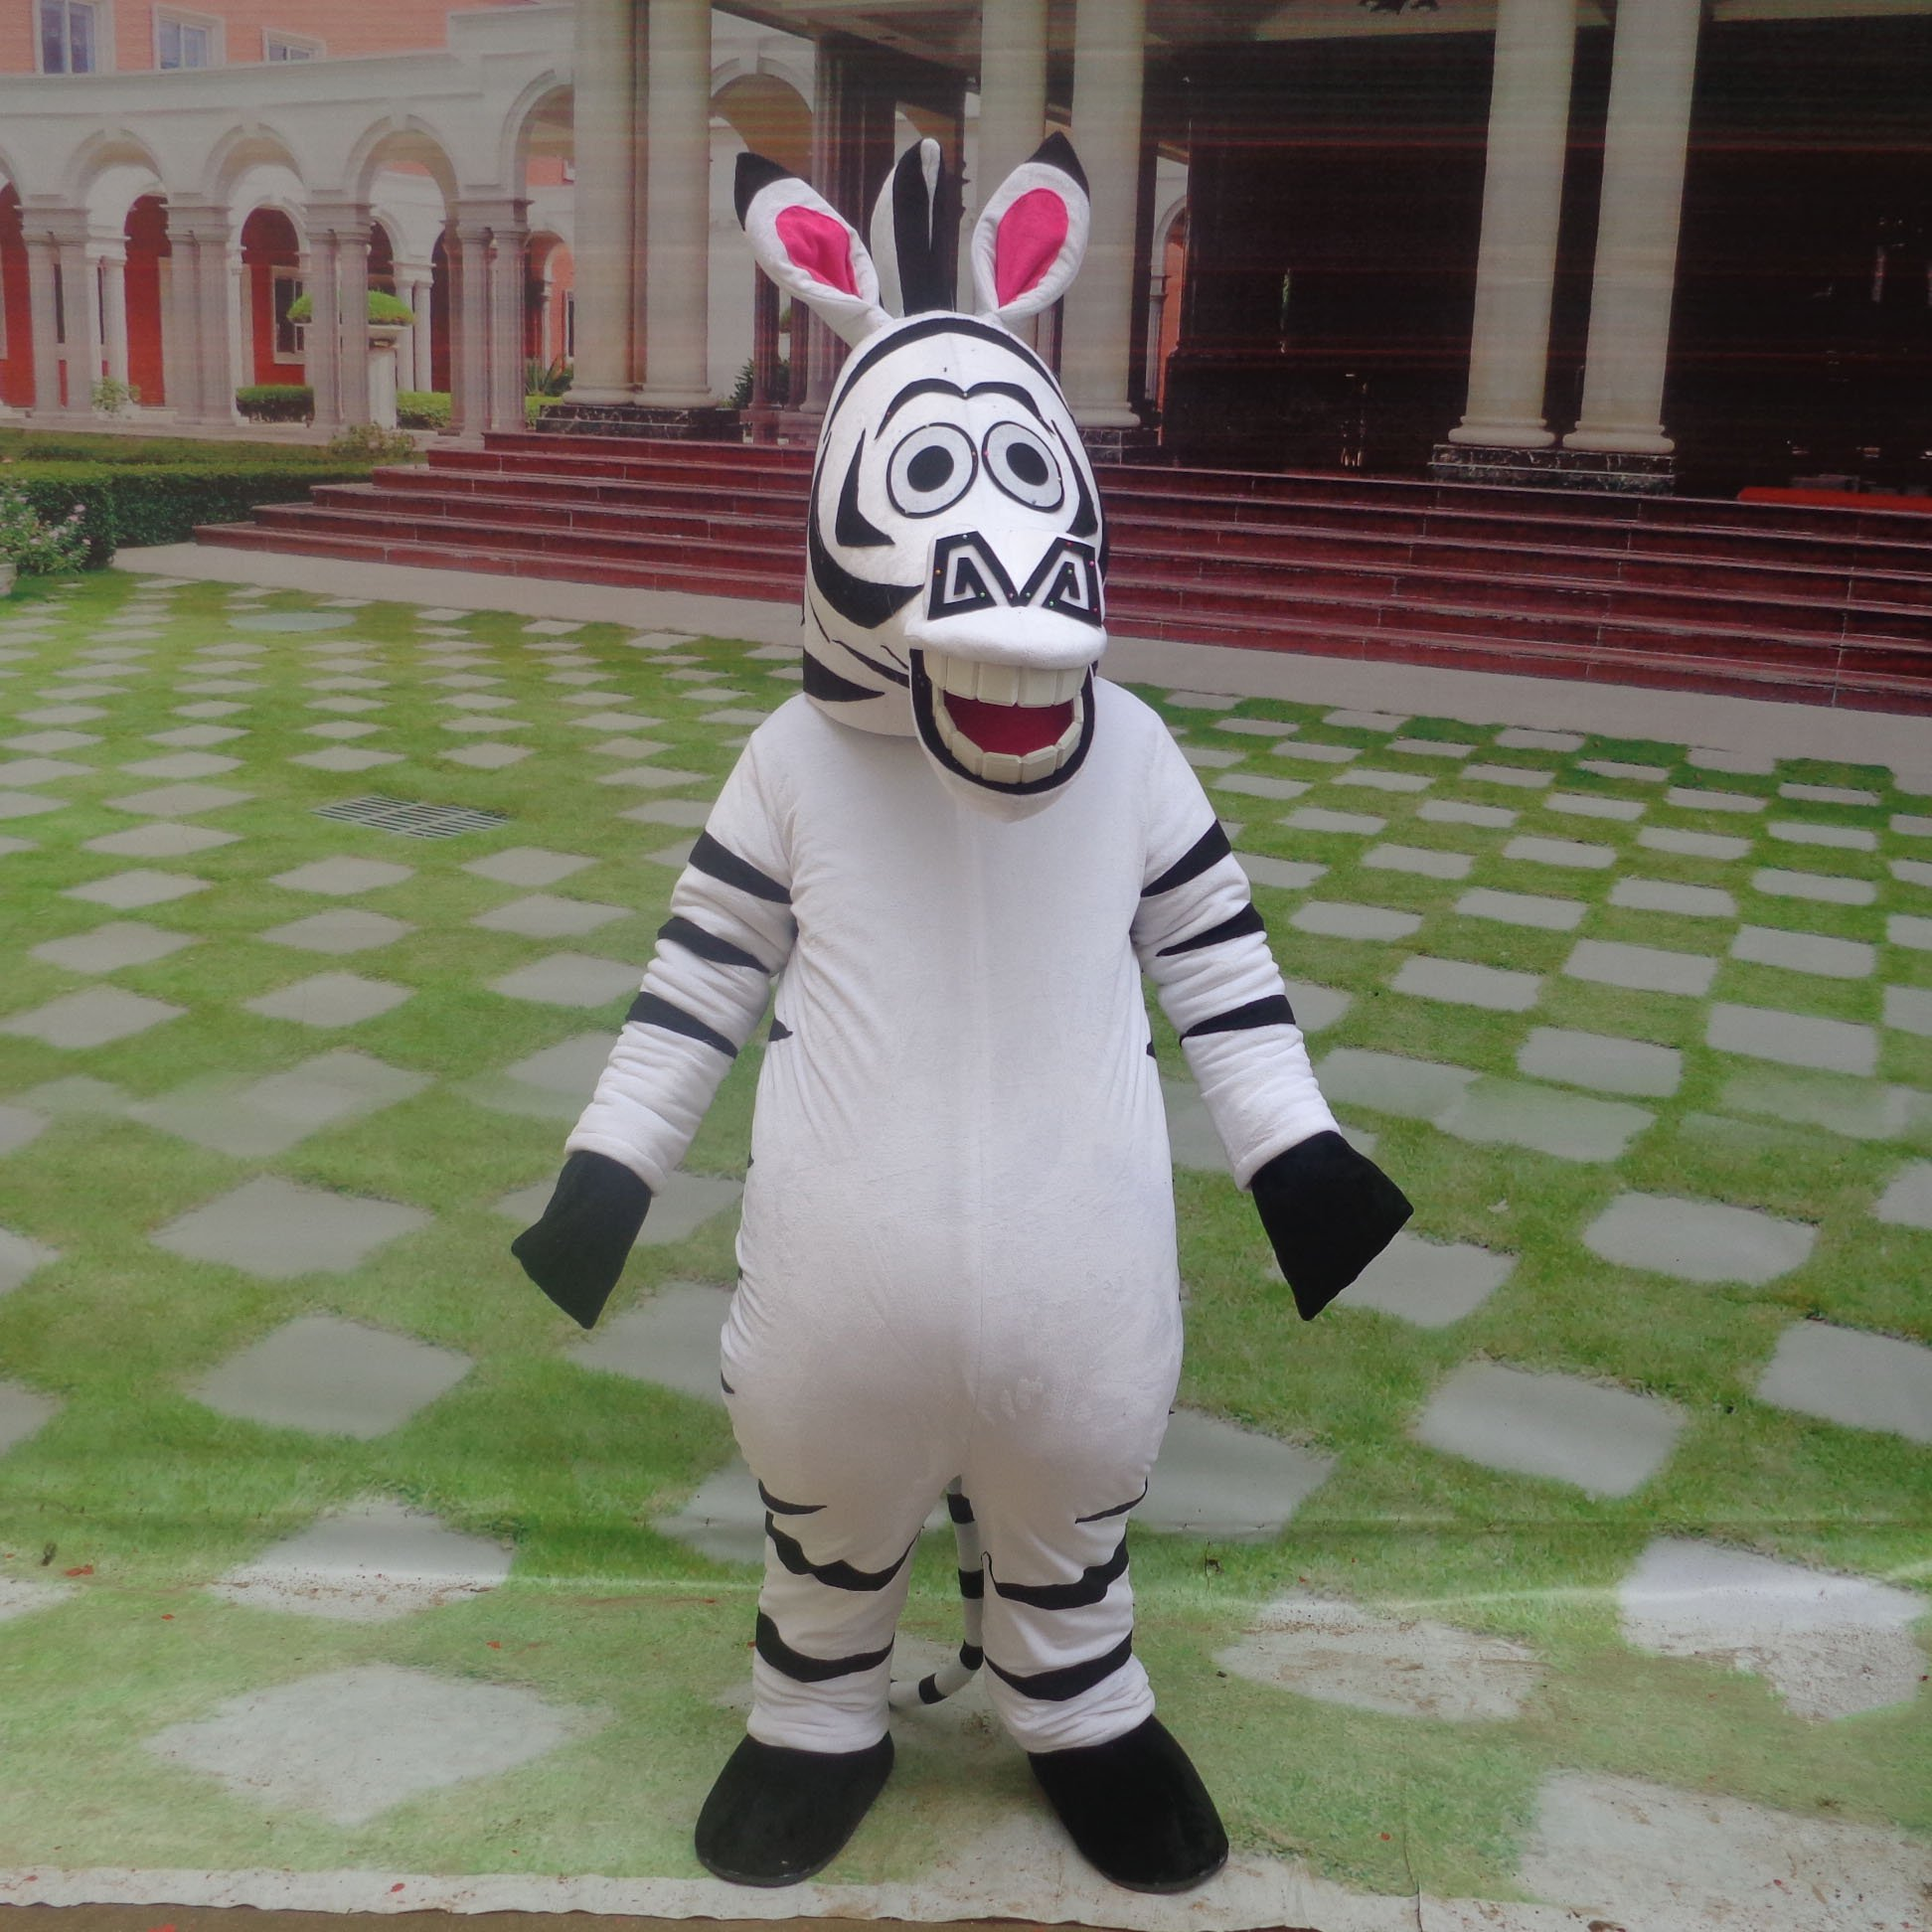 Cartoon Doll Clothing Cartoon Walking Doll Clothing Cartoon Show Clothing Doll Dress Zebra Animal Mascot Mascot Costume